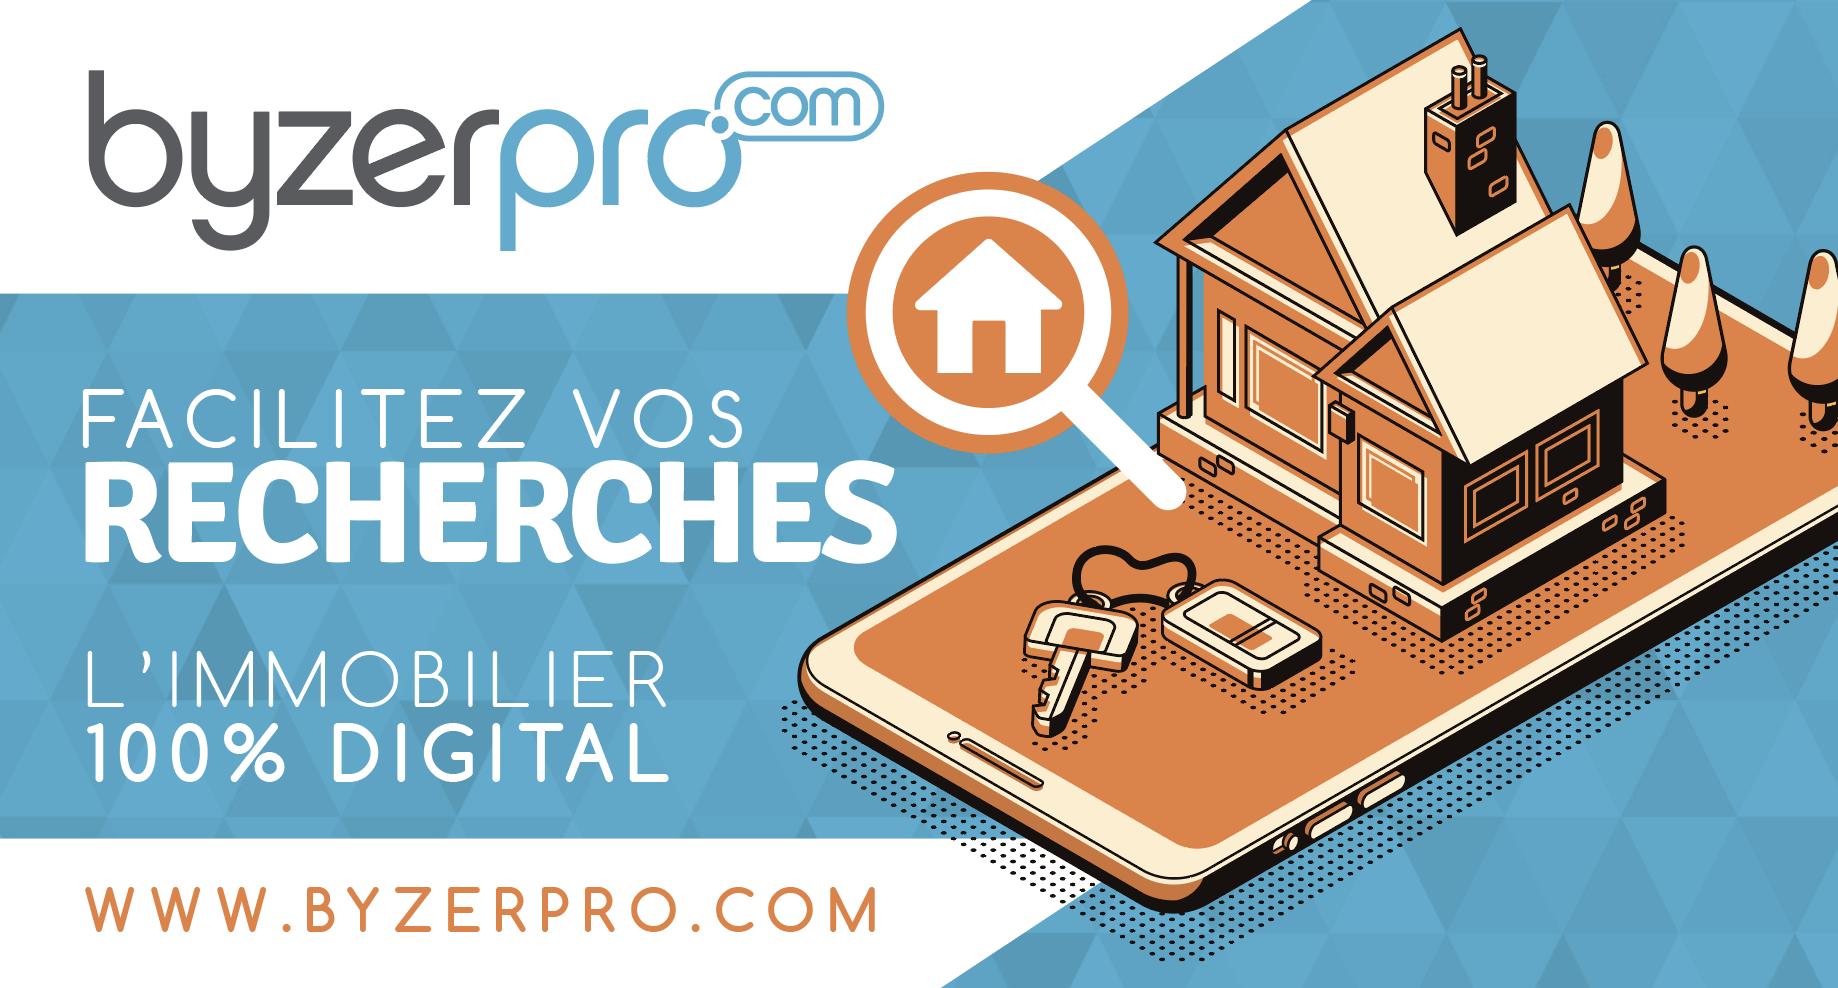 Immobilier digital Byzerpro.com